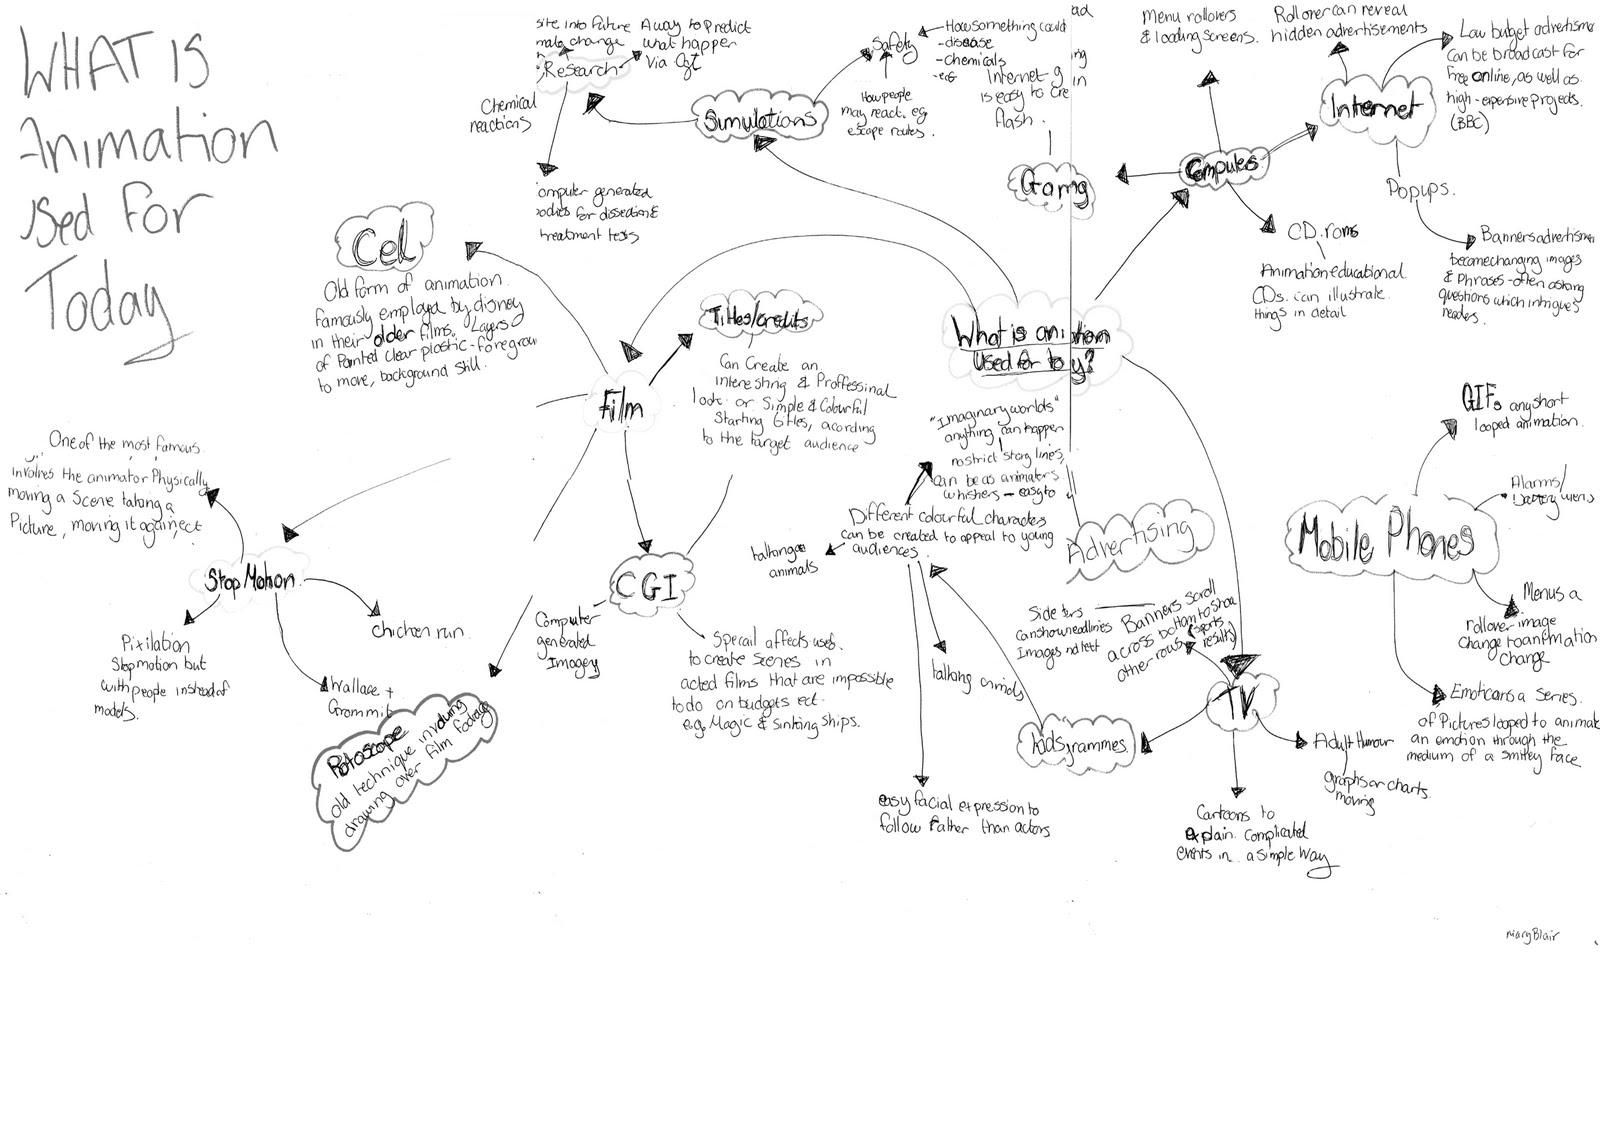 Animation Unit 2 Spider Diagrams